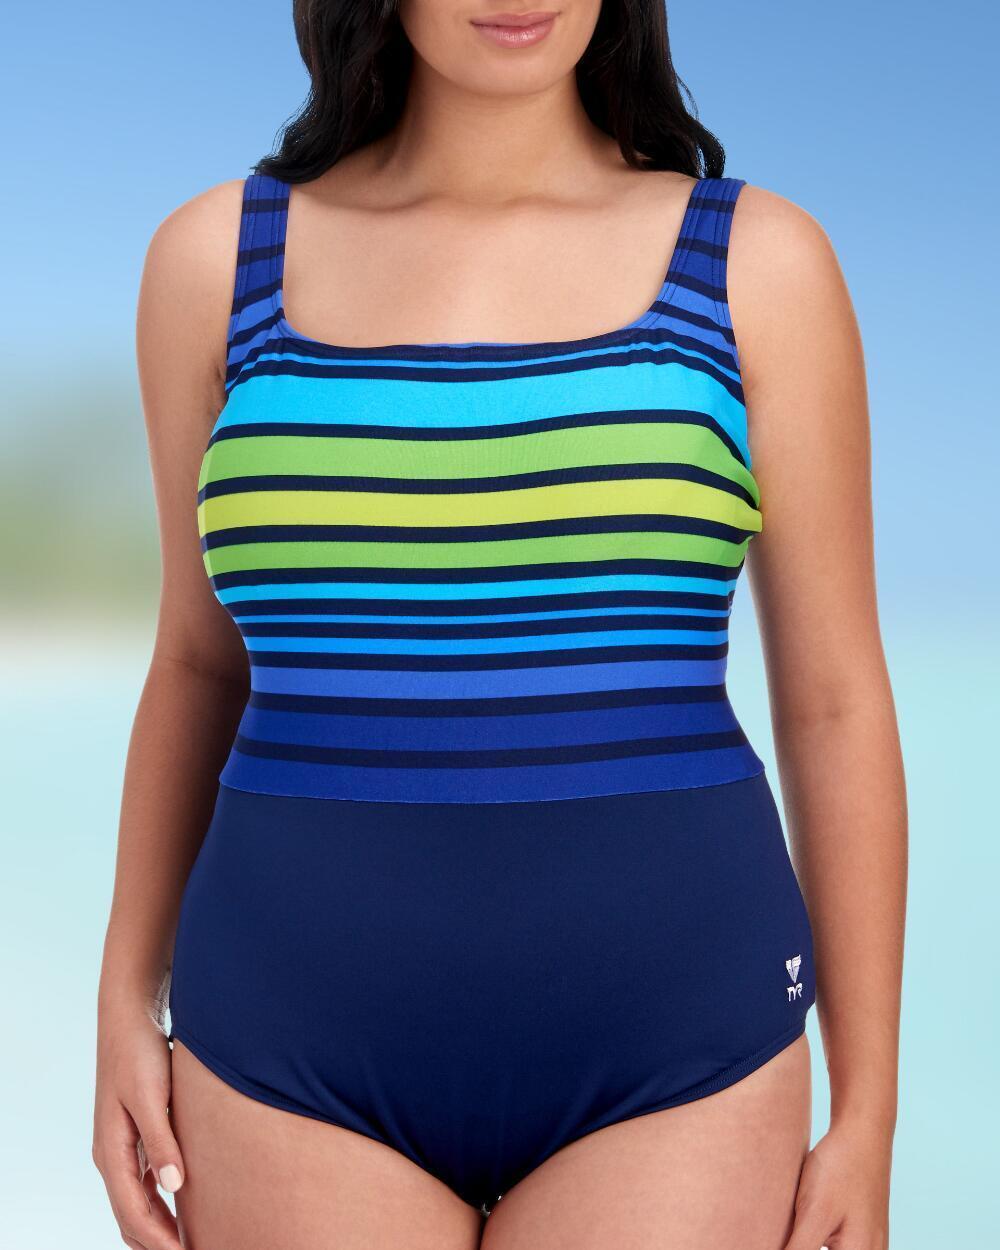 NEW TYR Women's Ombre Stripe Aqua Tummy Control Fit Plus Size 22 Navy Green  80